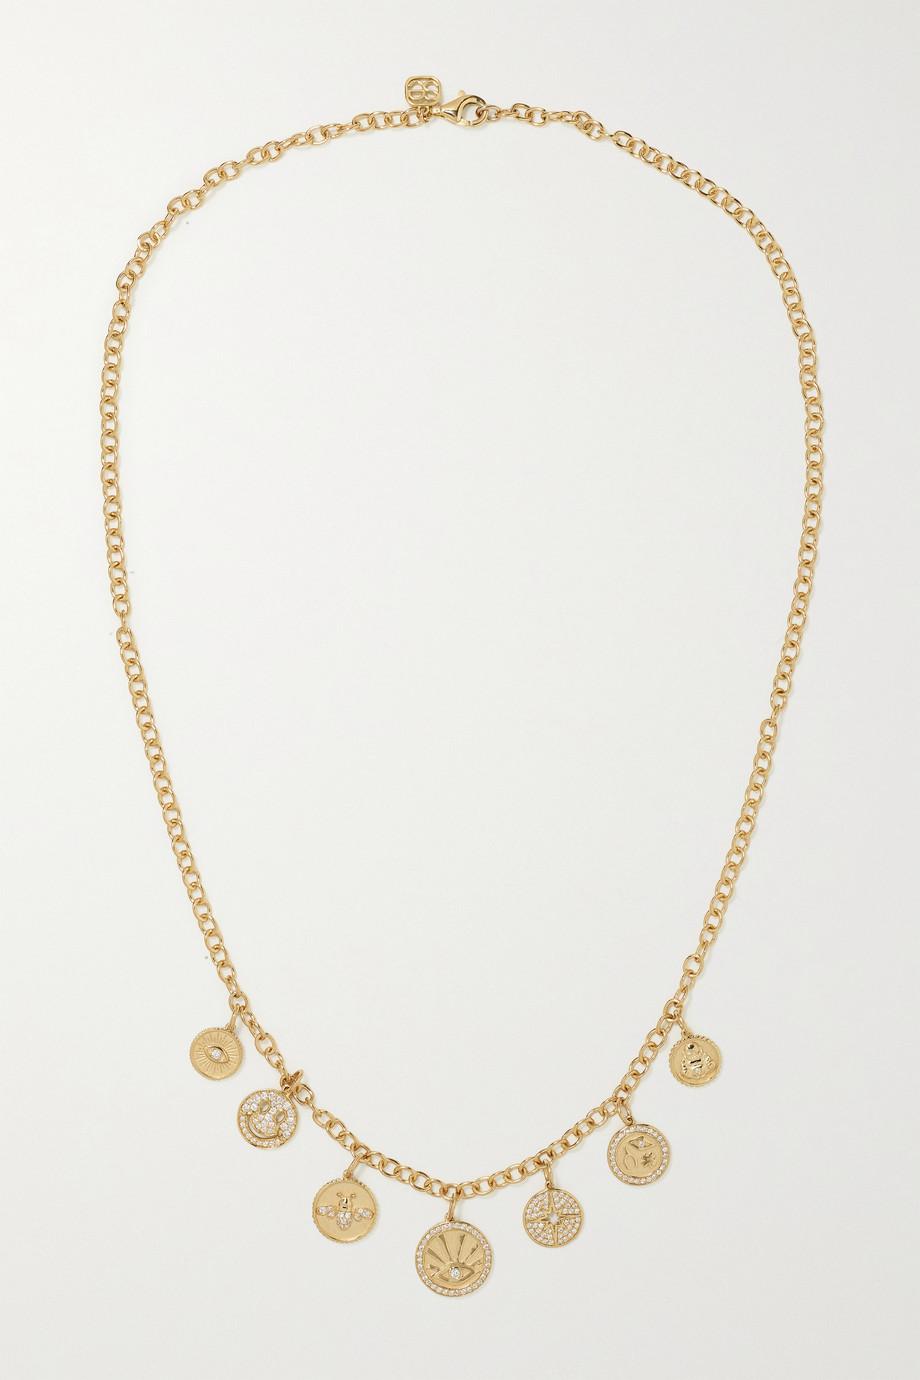 Sydney Evan Medallions 14-karat gold diamond necklace